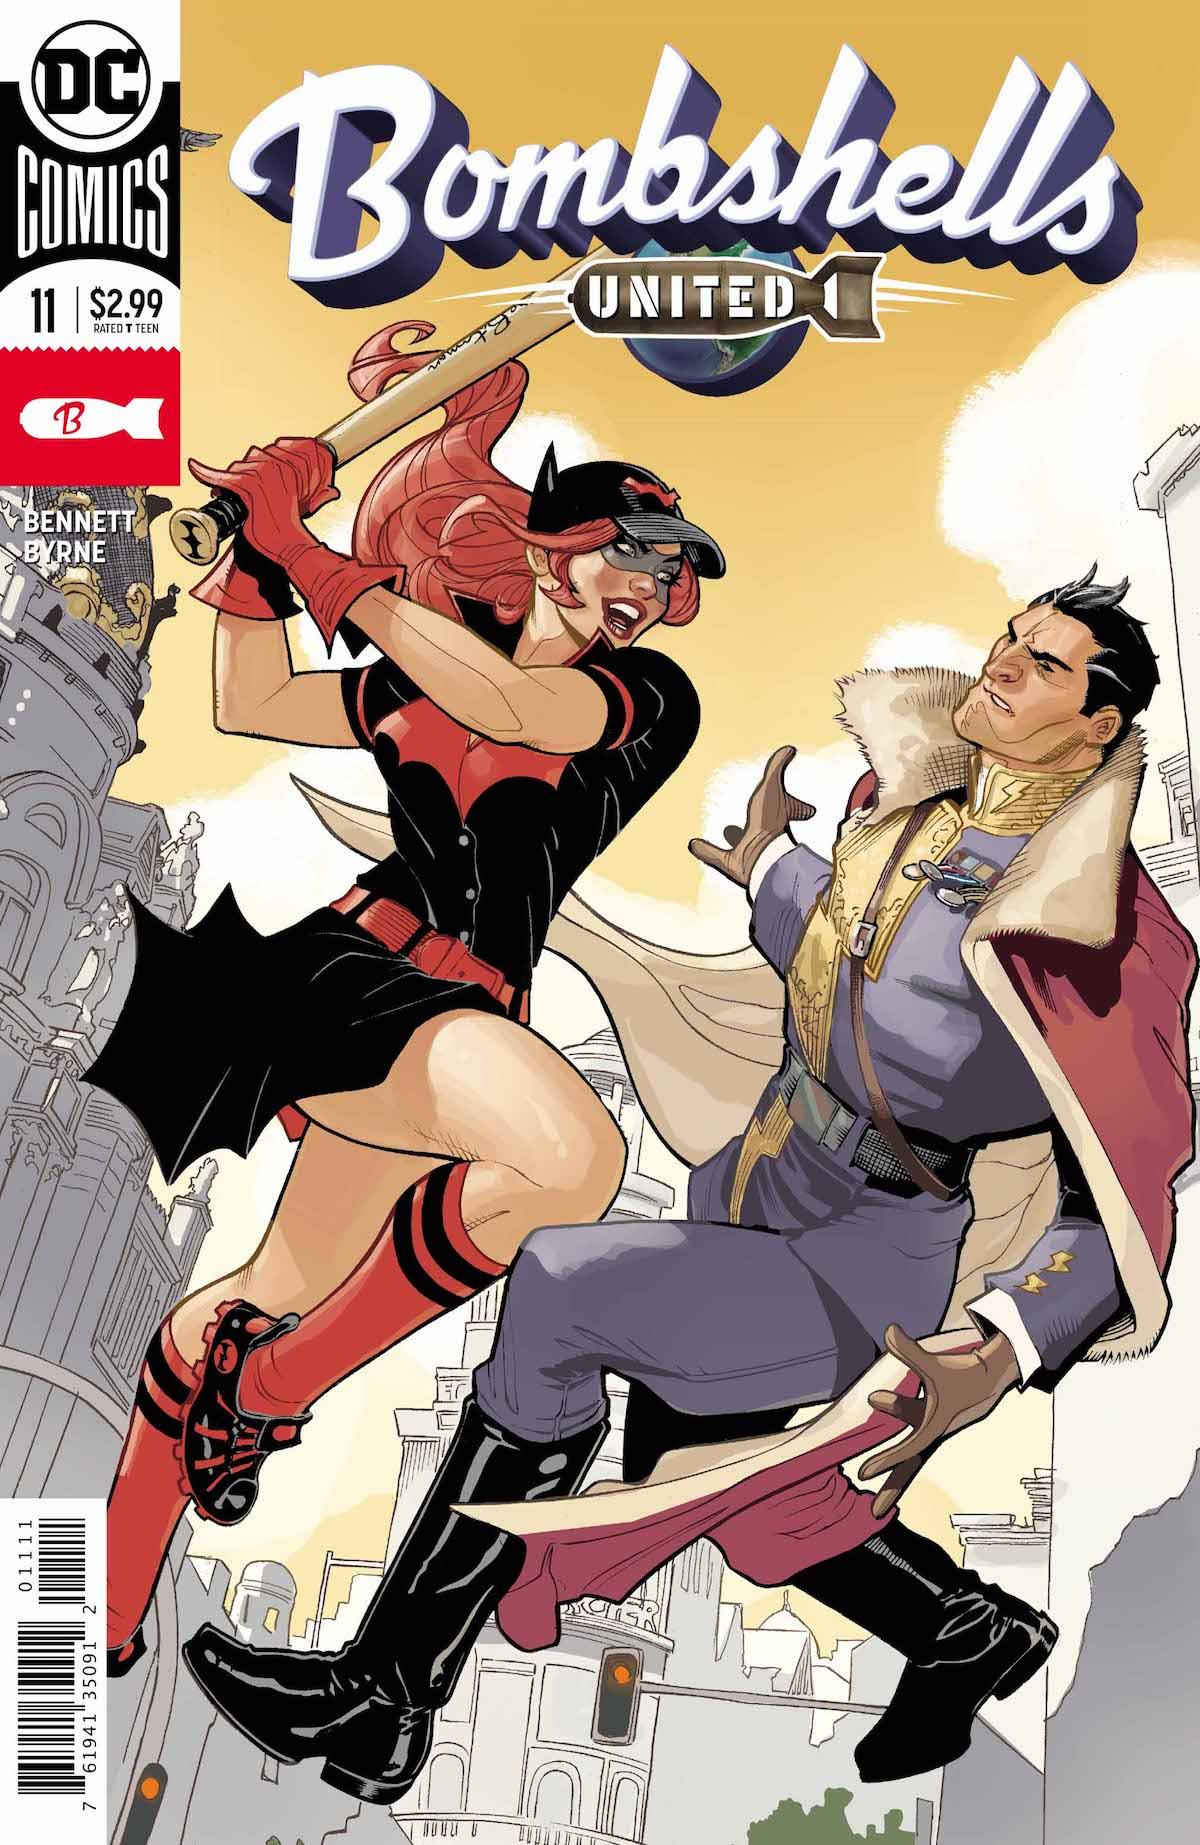 DC Bombshells United #11 cover